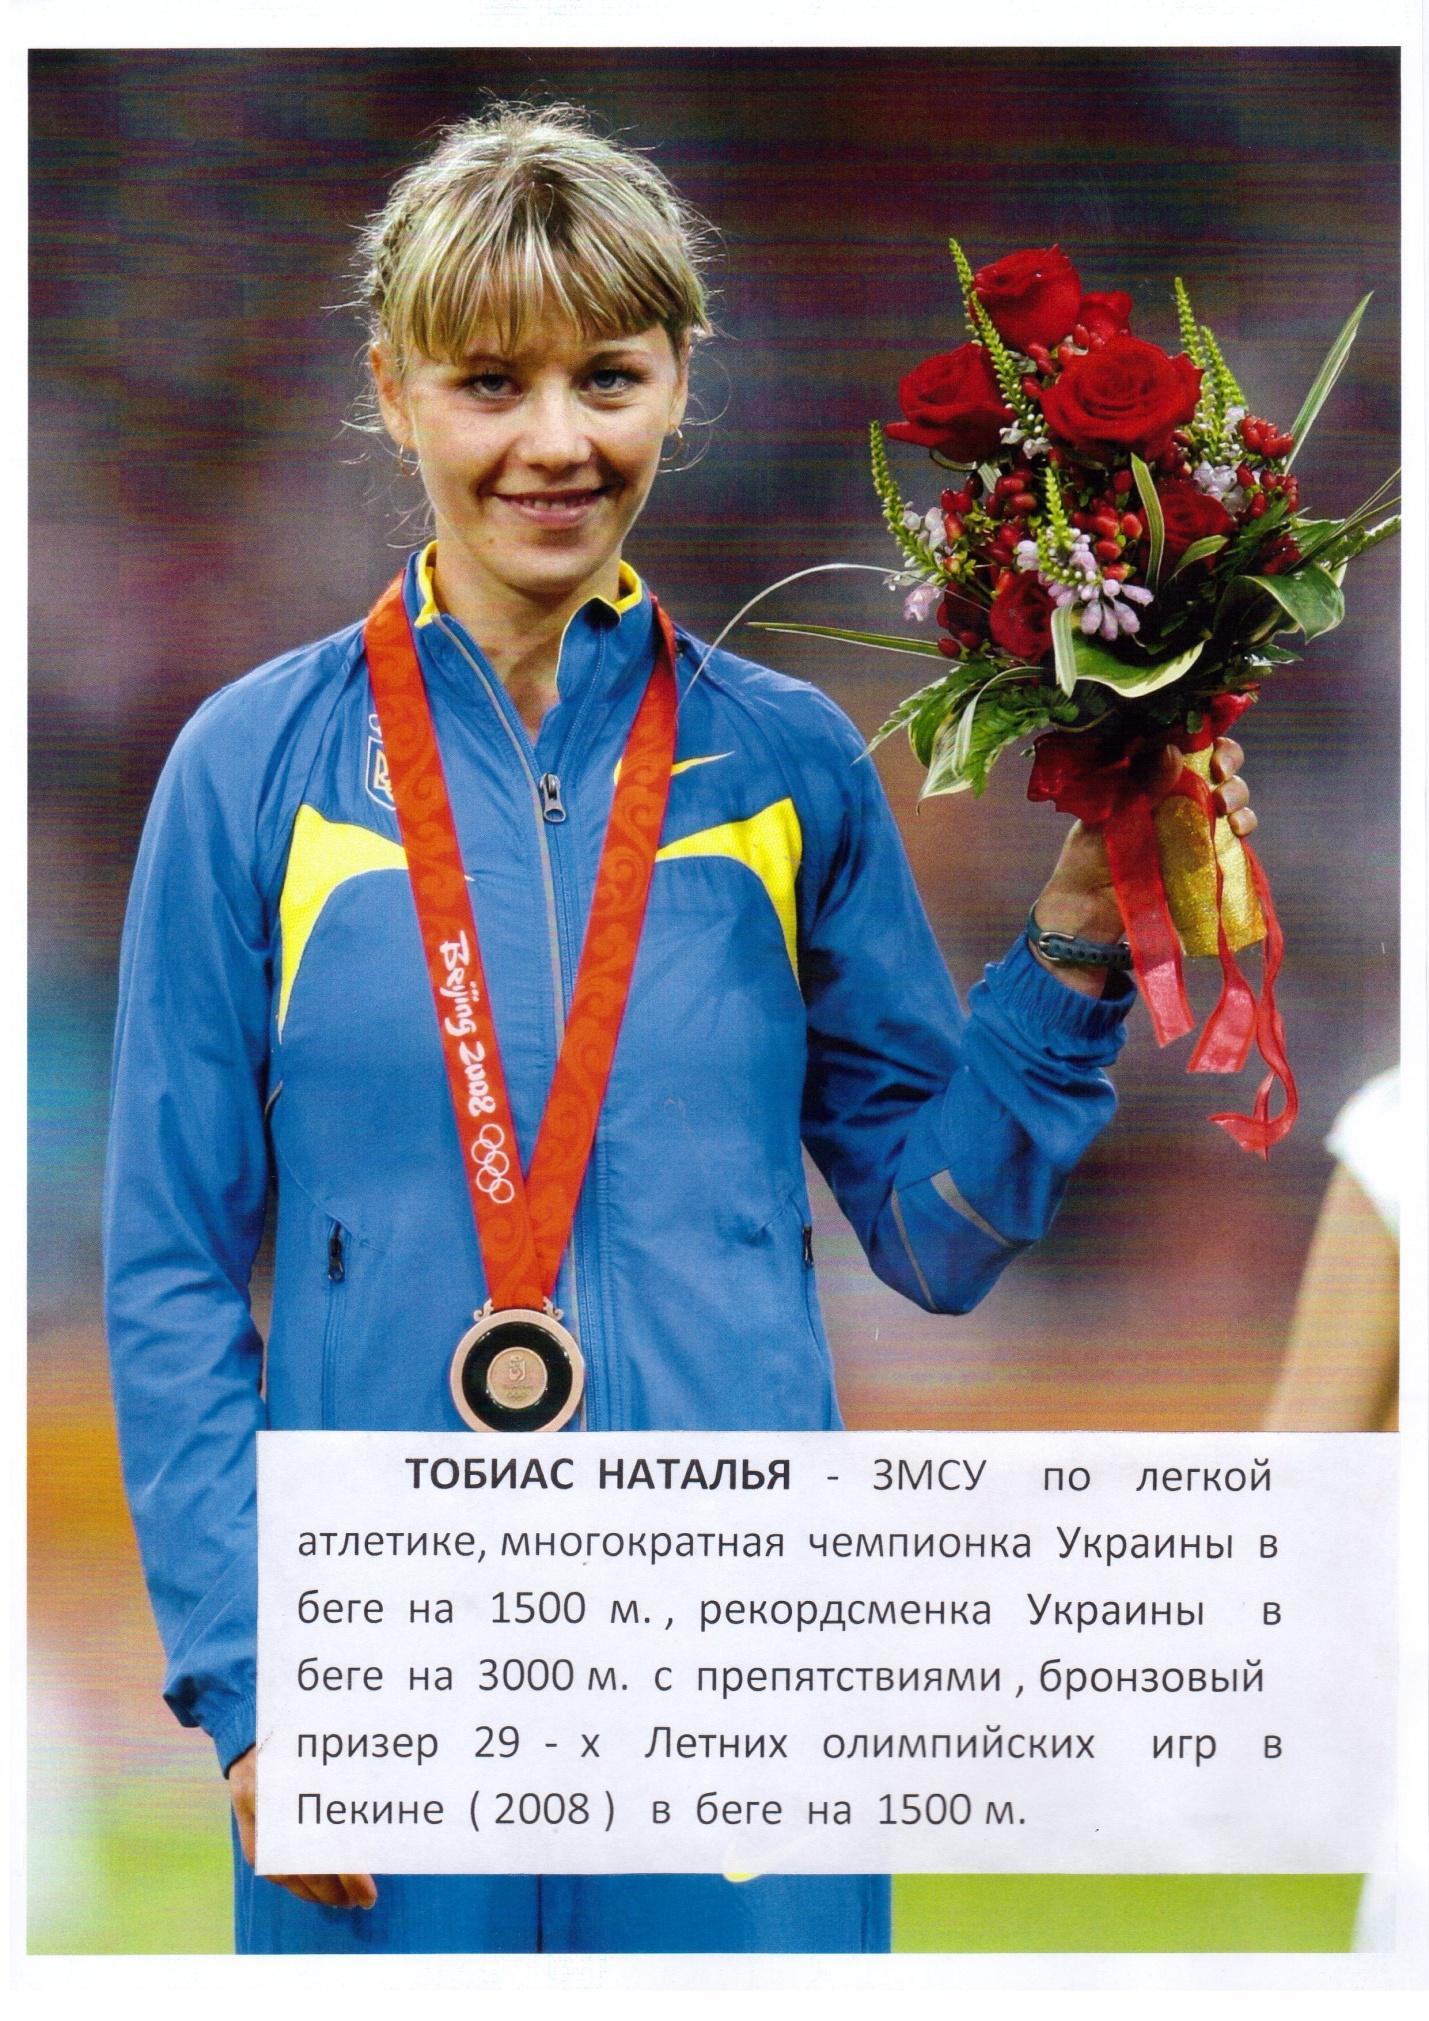 G:\Cпорт2(русский язык)\scan 4.jpg